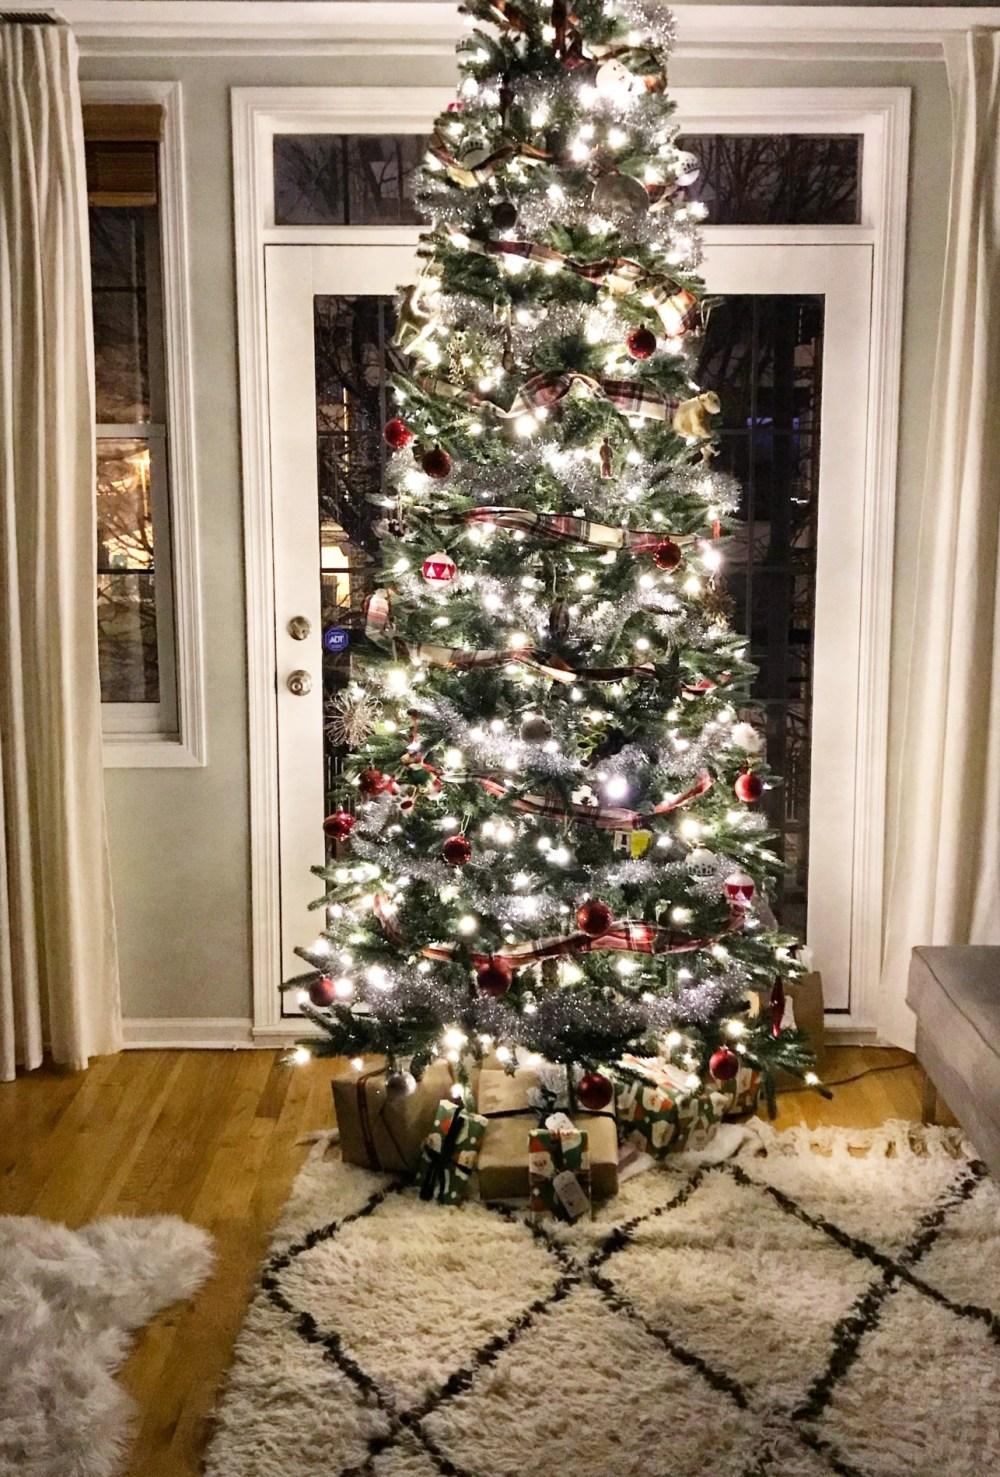 The Glow of My Christmas Tree